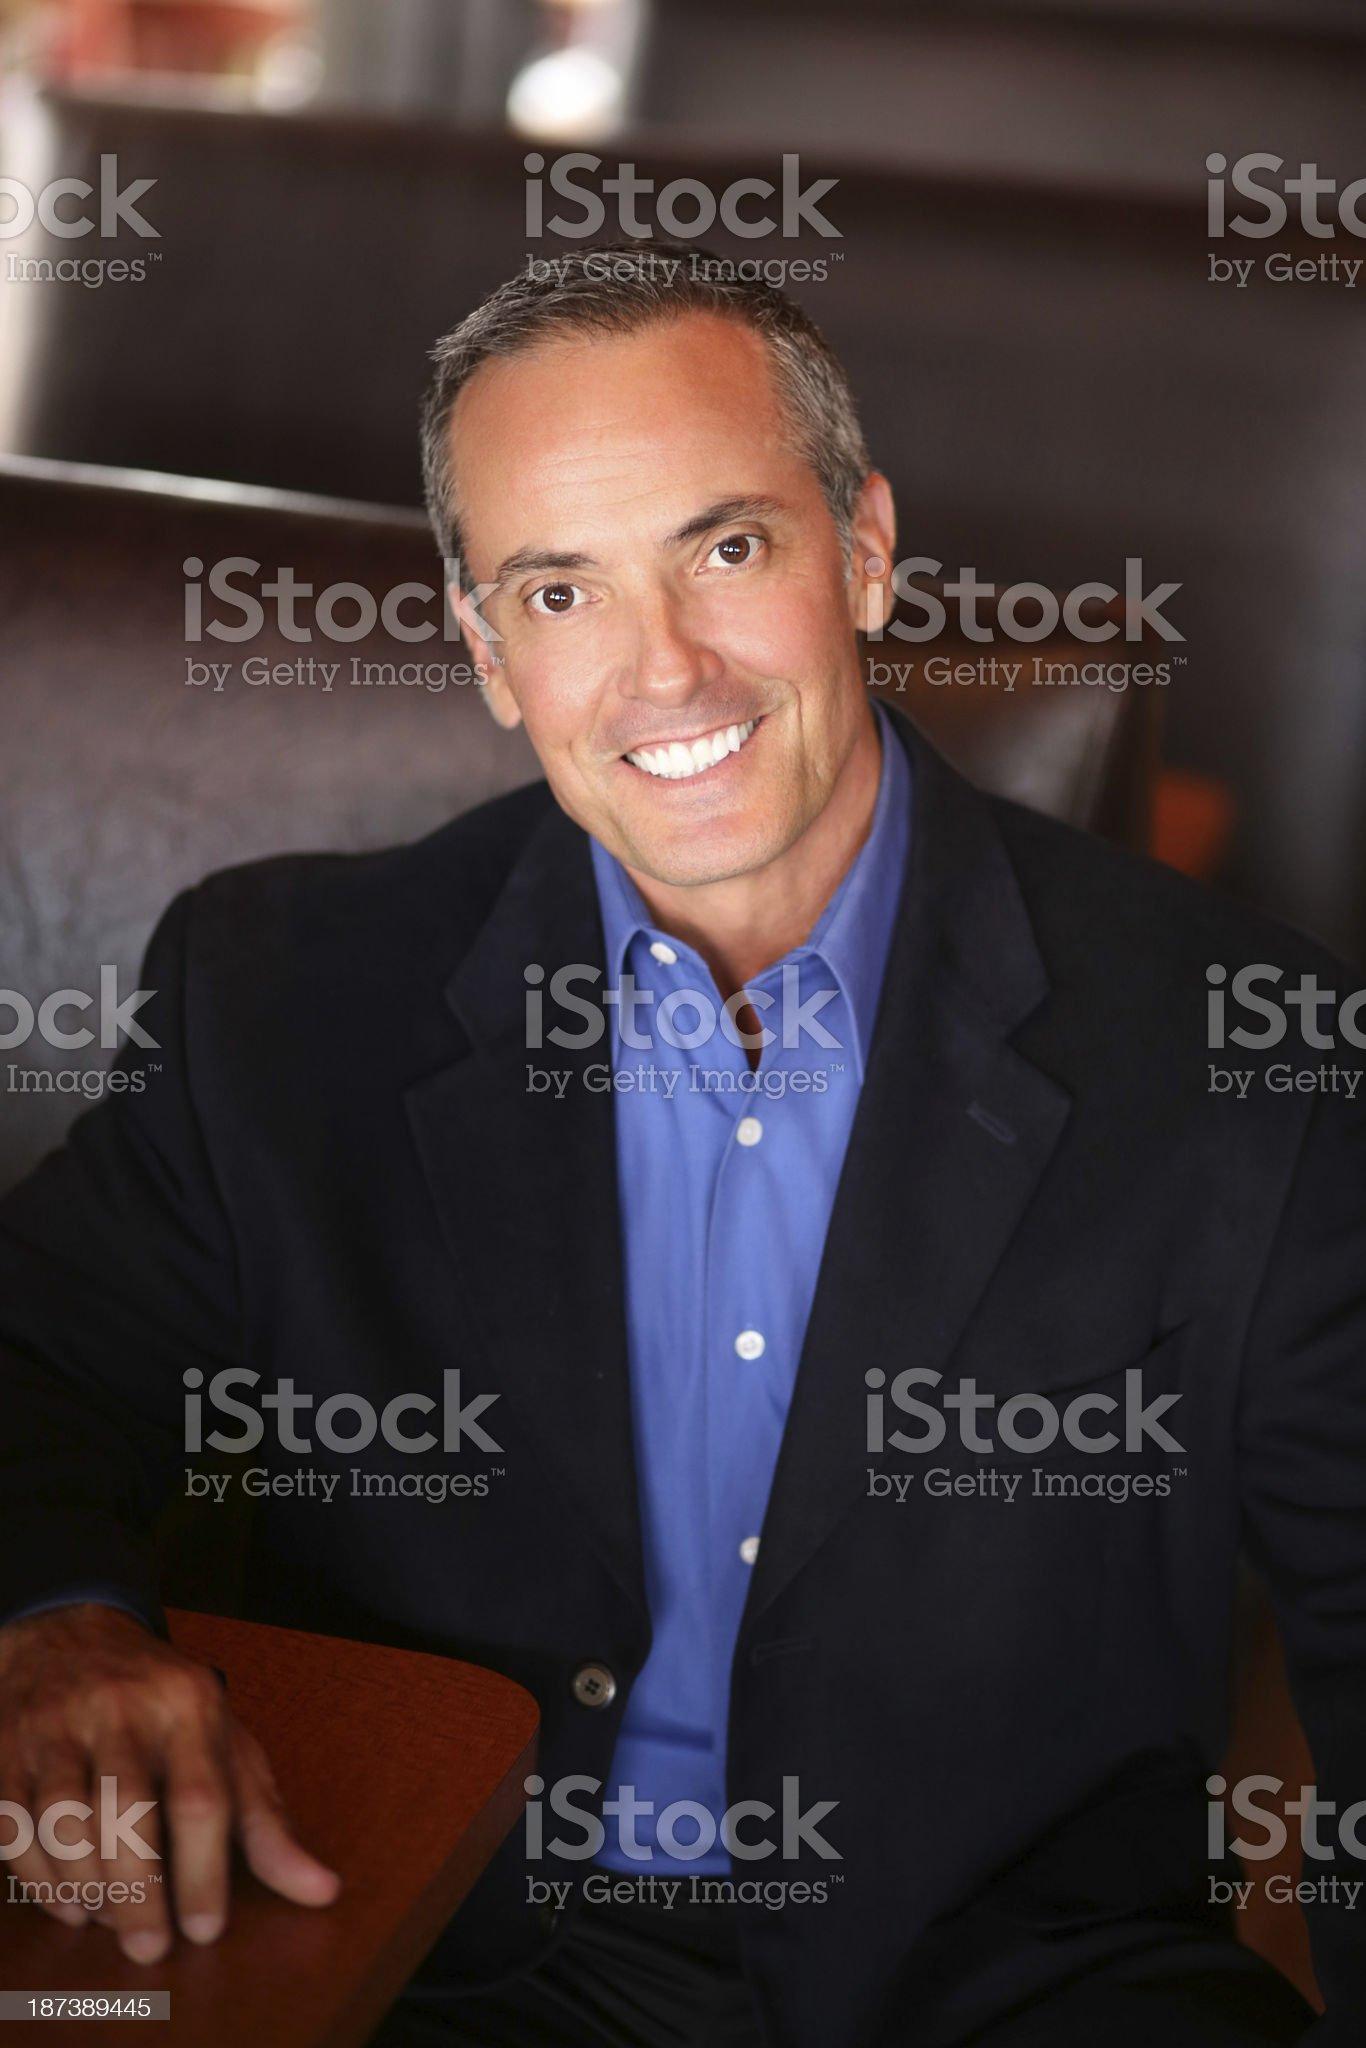 Confident Businessman Sitting In Restaurant royalty-free stock photo